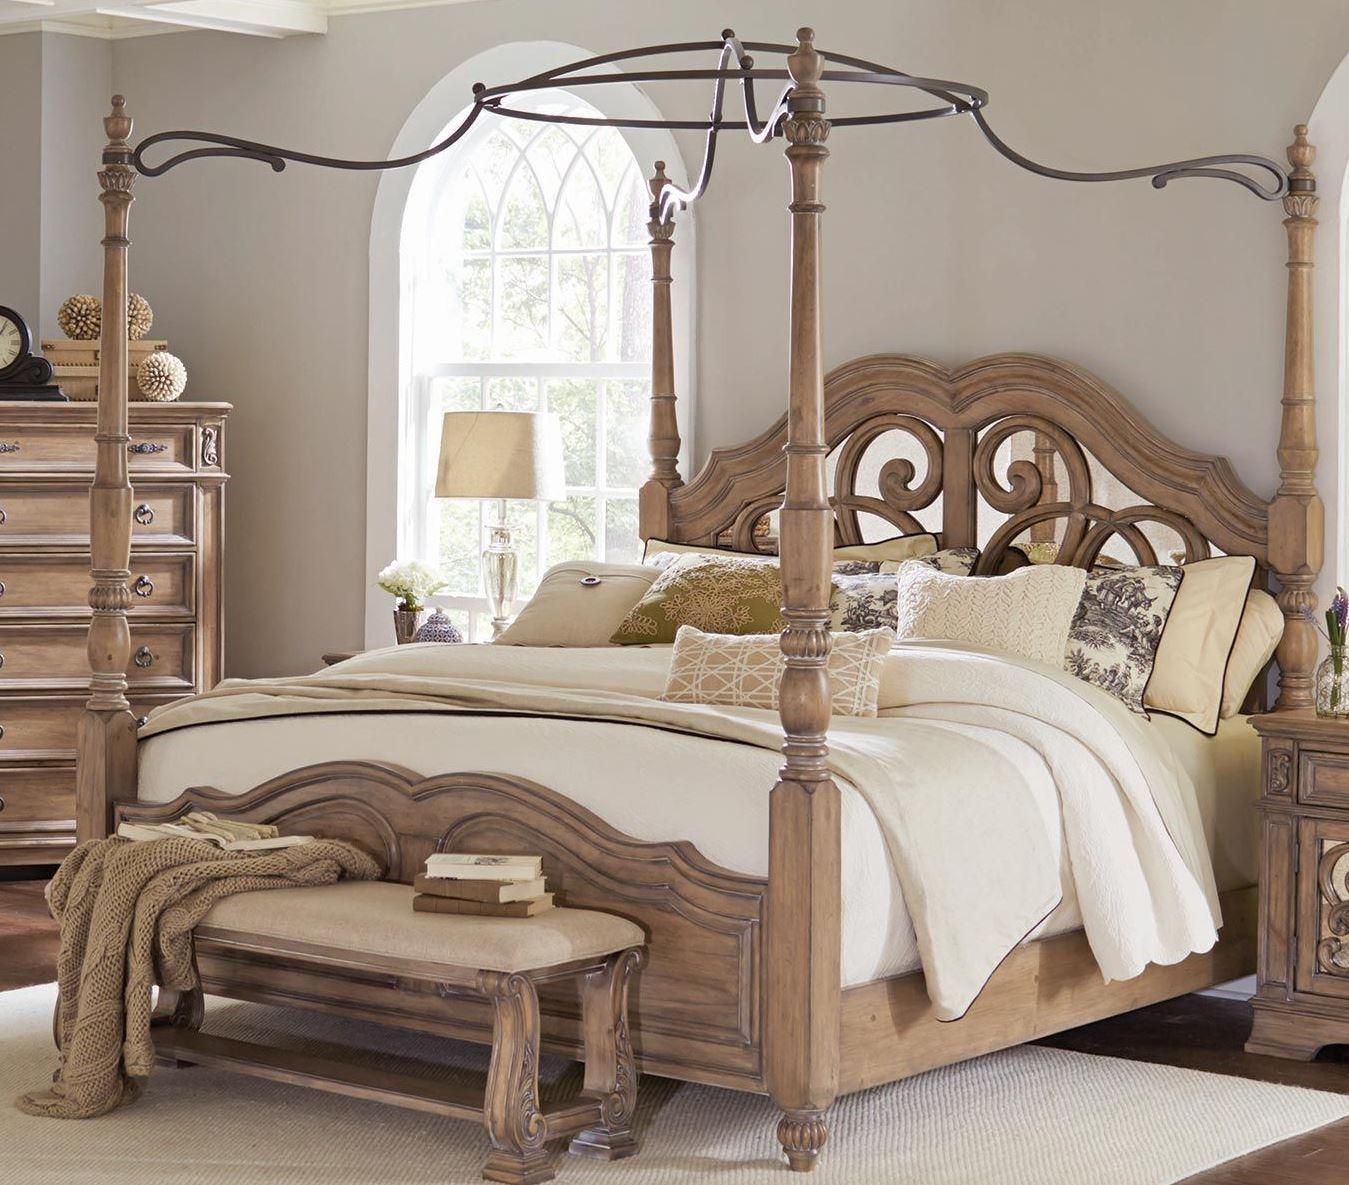 Ilana antique linen poster bedroom set 205071q coaster furniture for Annifern poster bedroom collection